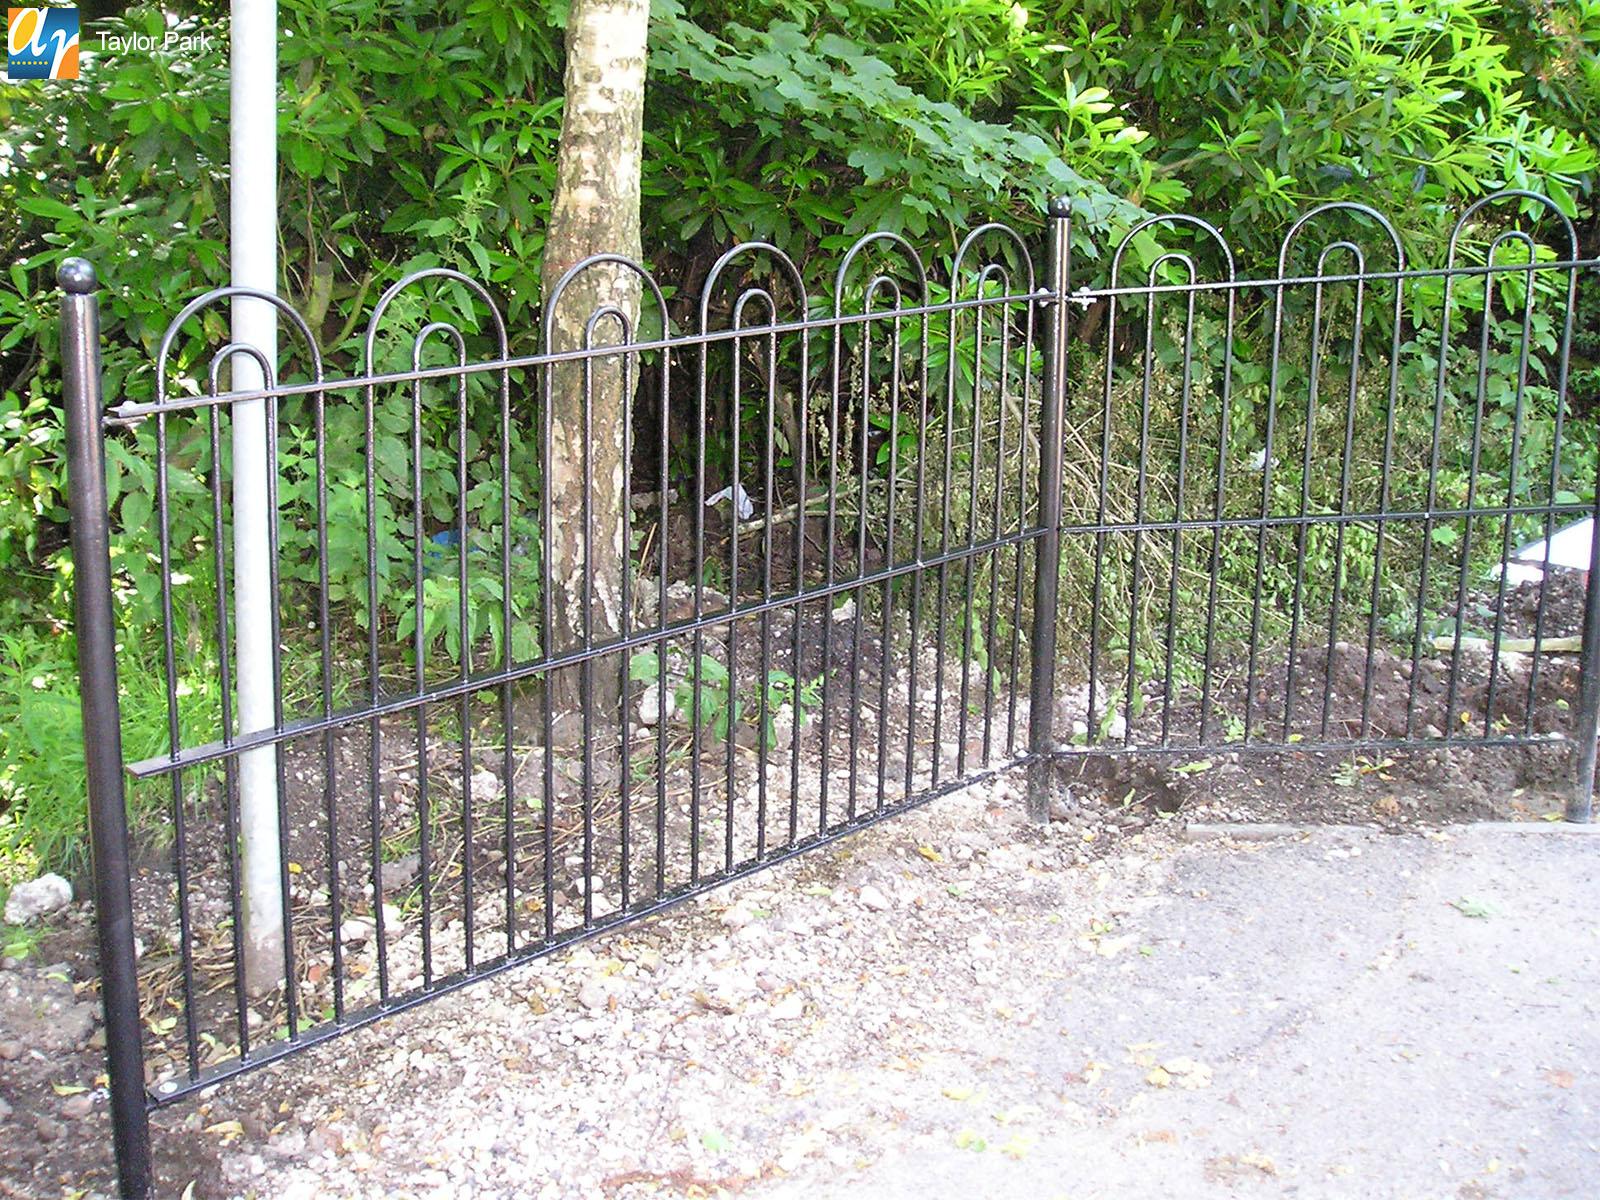 Taylor Park Holinwell bow top railings